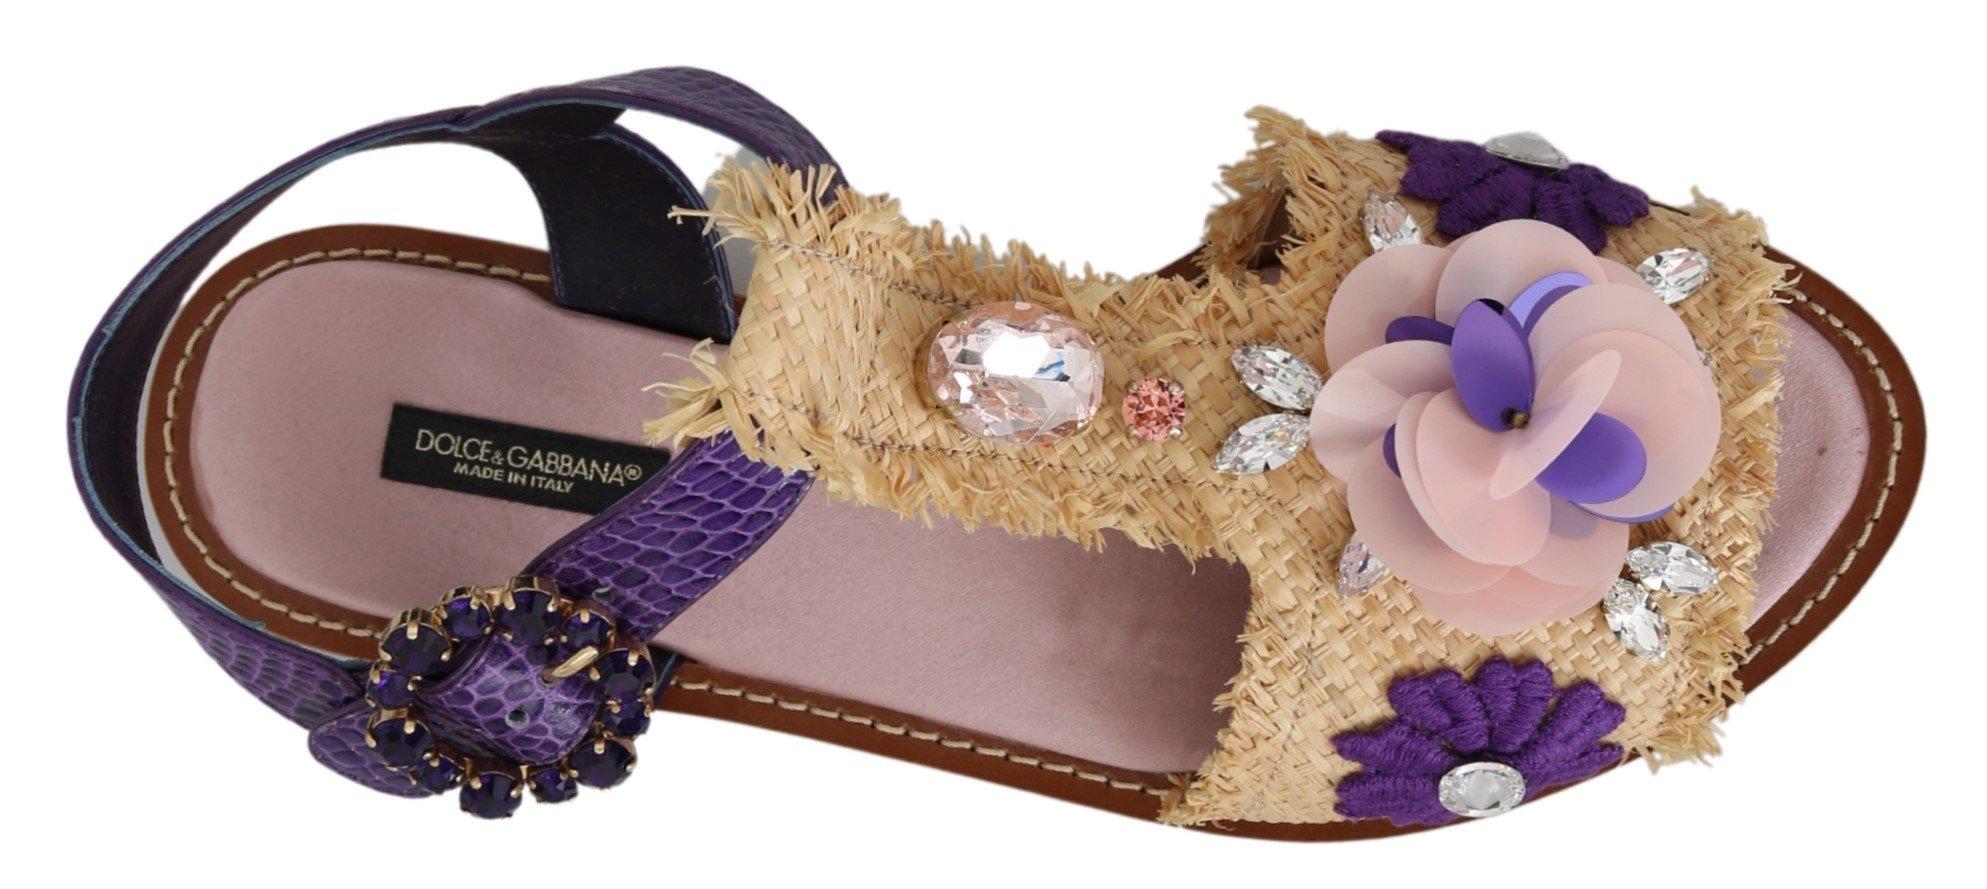 Dolce & Gabbana Women's Leather Crystal Sandal Purple LA6887 - EU39/US8.5